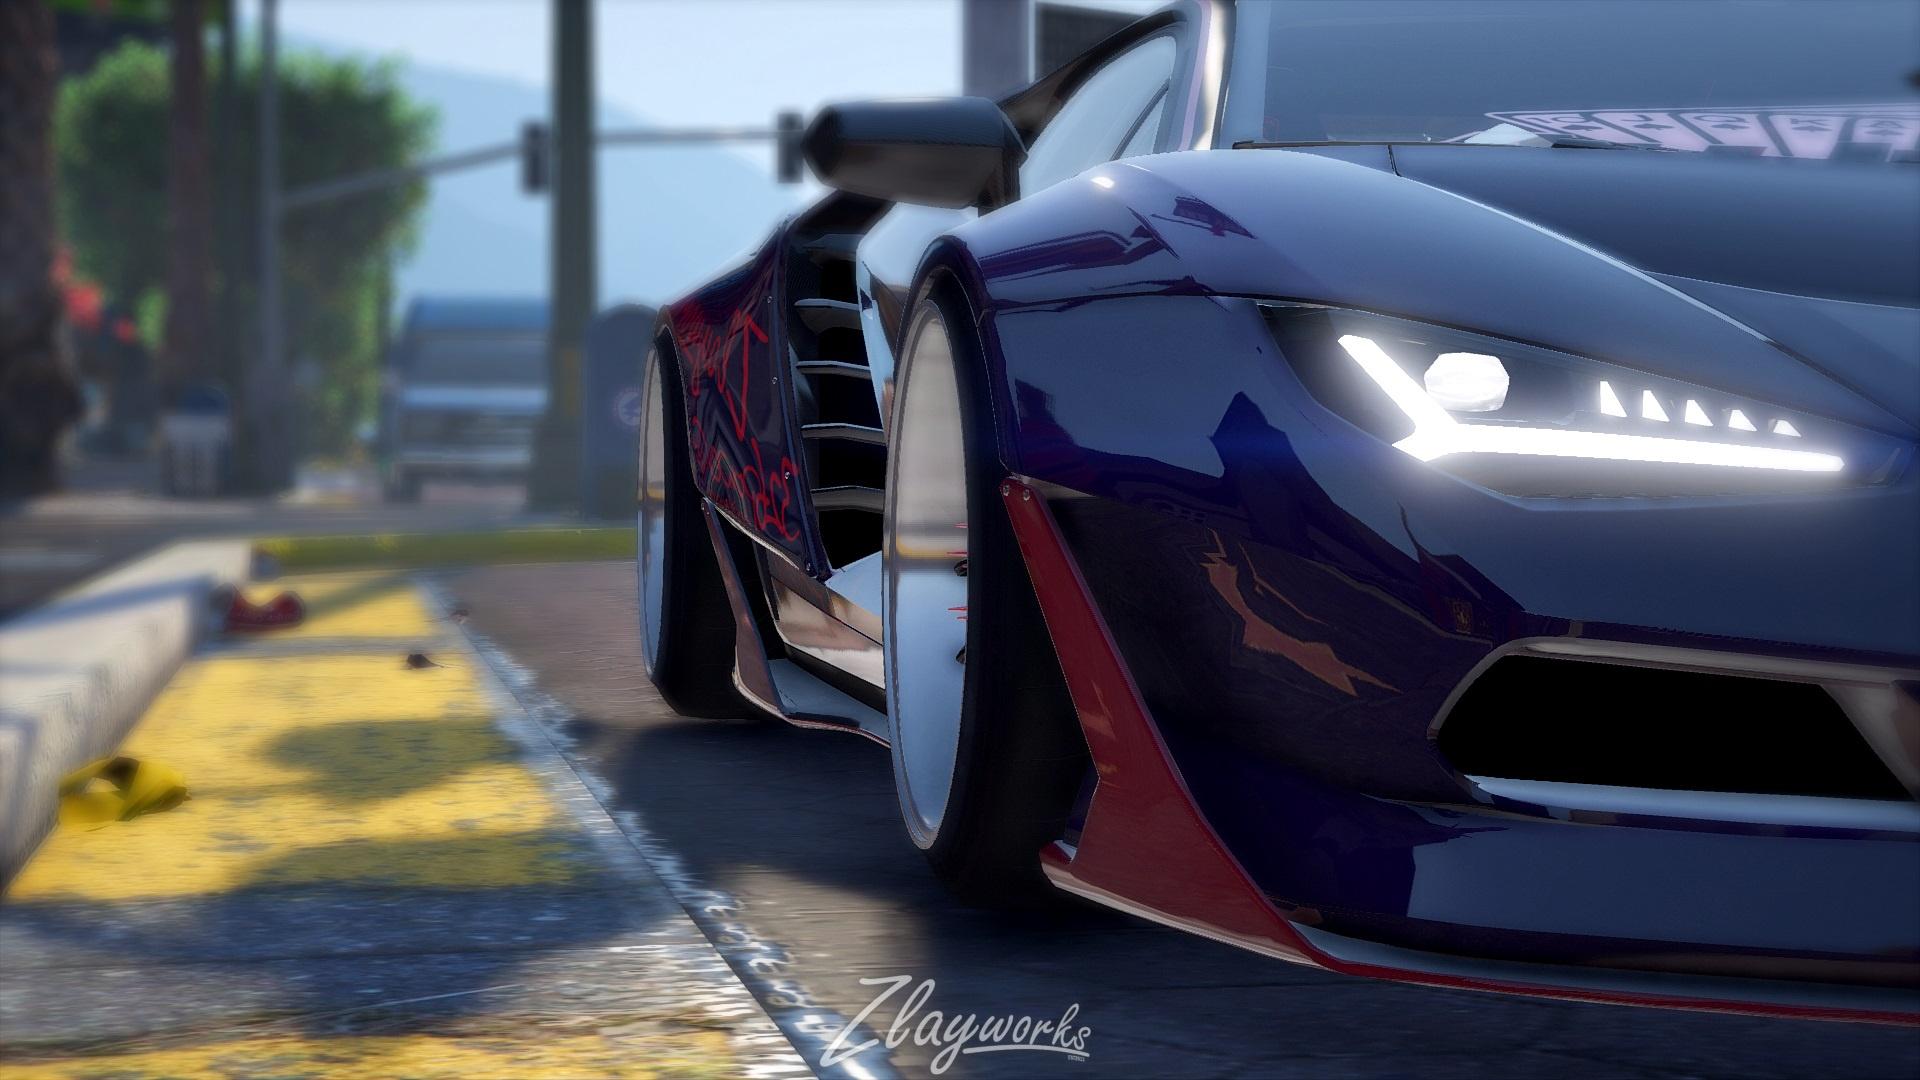 Zlayworks Lamborghini Zentenario Add On Replace Gta5 Mods Com